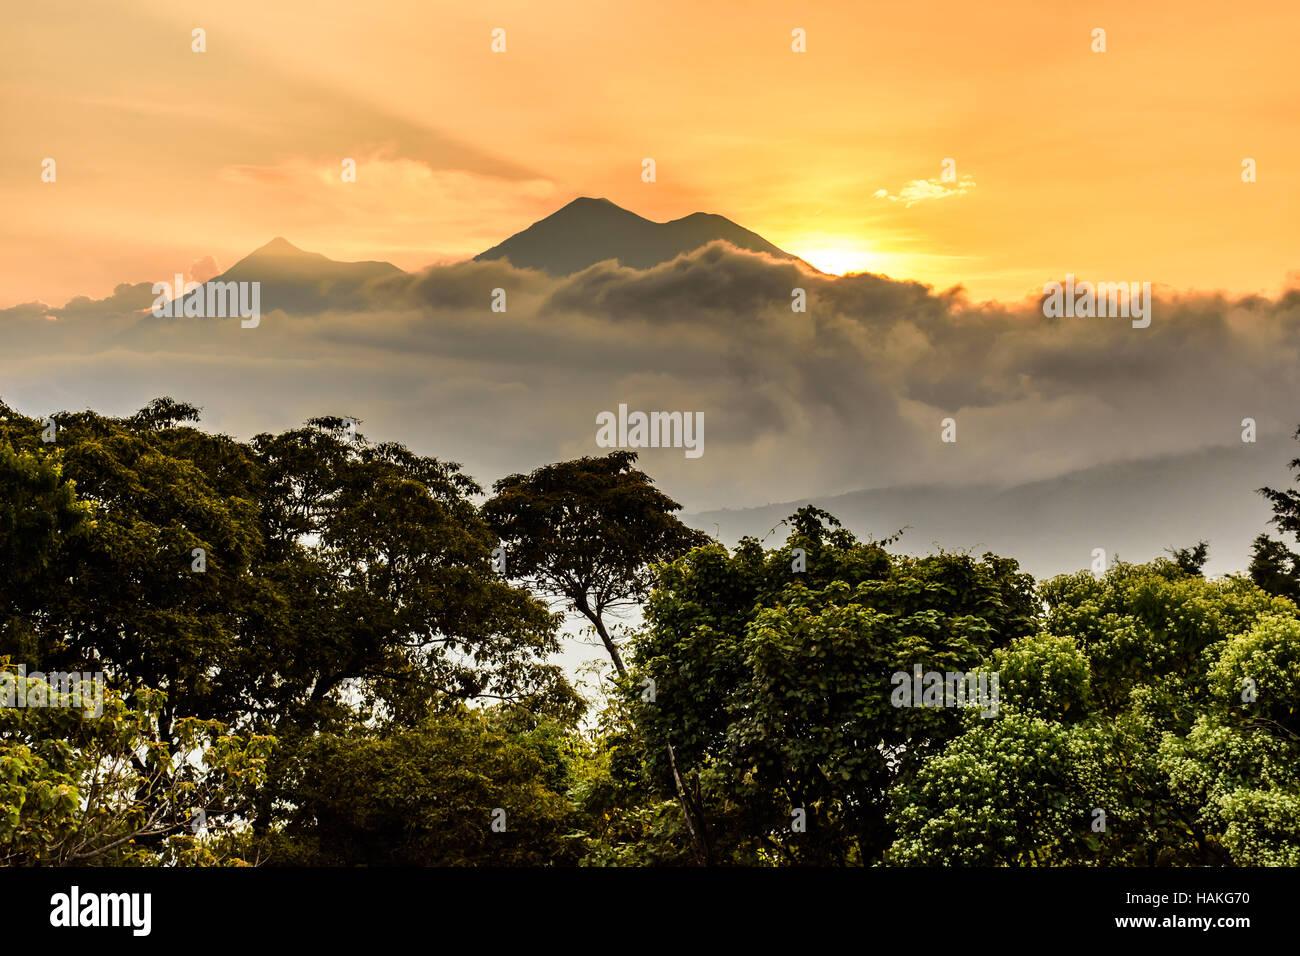 Fuego & Acatenango volcanoes at sunset outside UNESCO World Heritage Site of Antigua, Guatemala, Central America - Stock Image